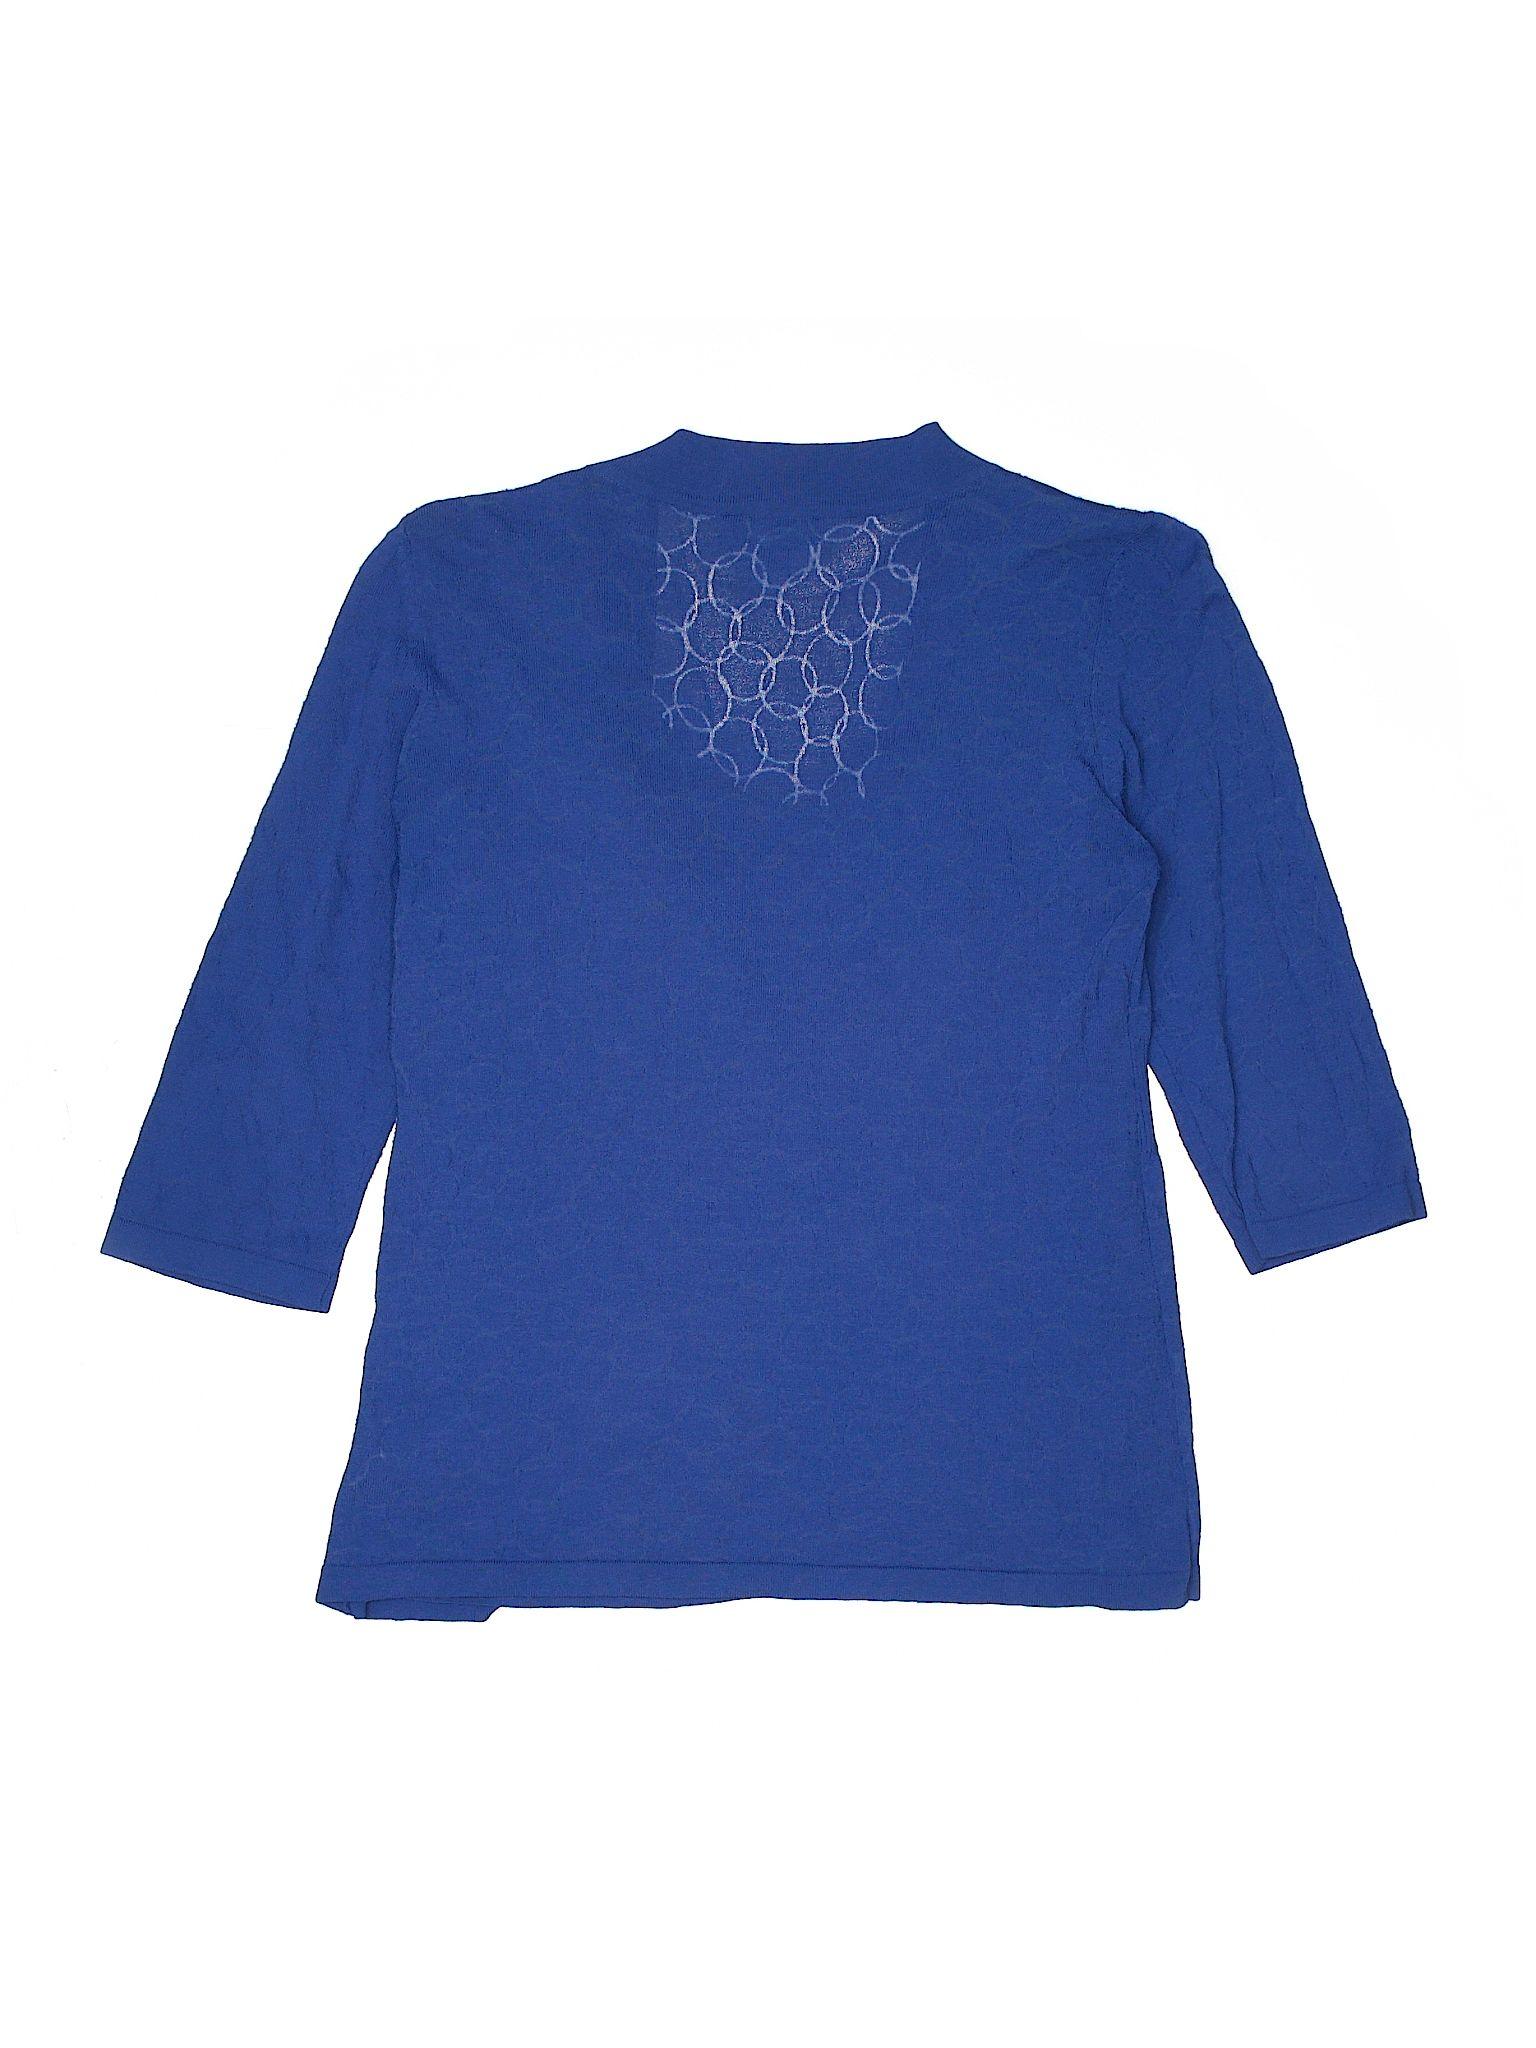 24148df39b0391 Studio JPR 3 4 Sleeve Blouse  Size 8.00 Blue Women s Tops -  6.99